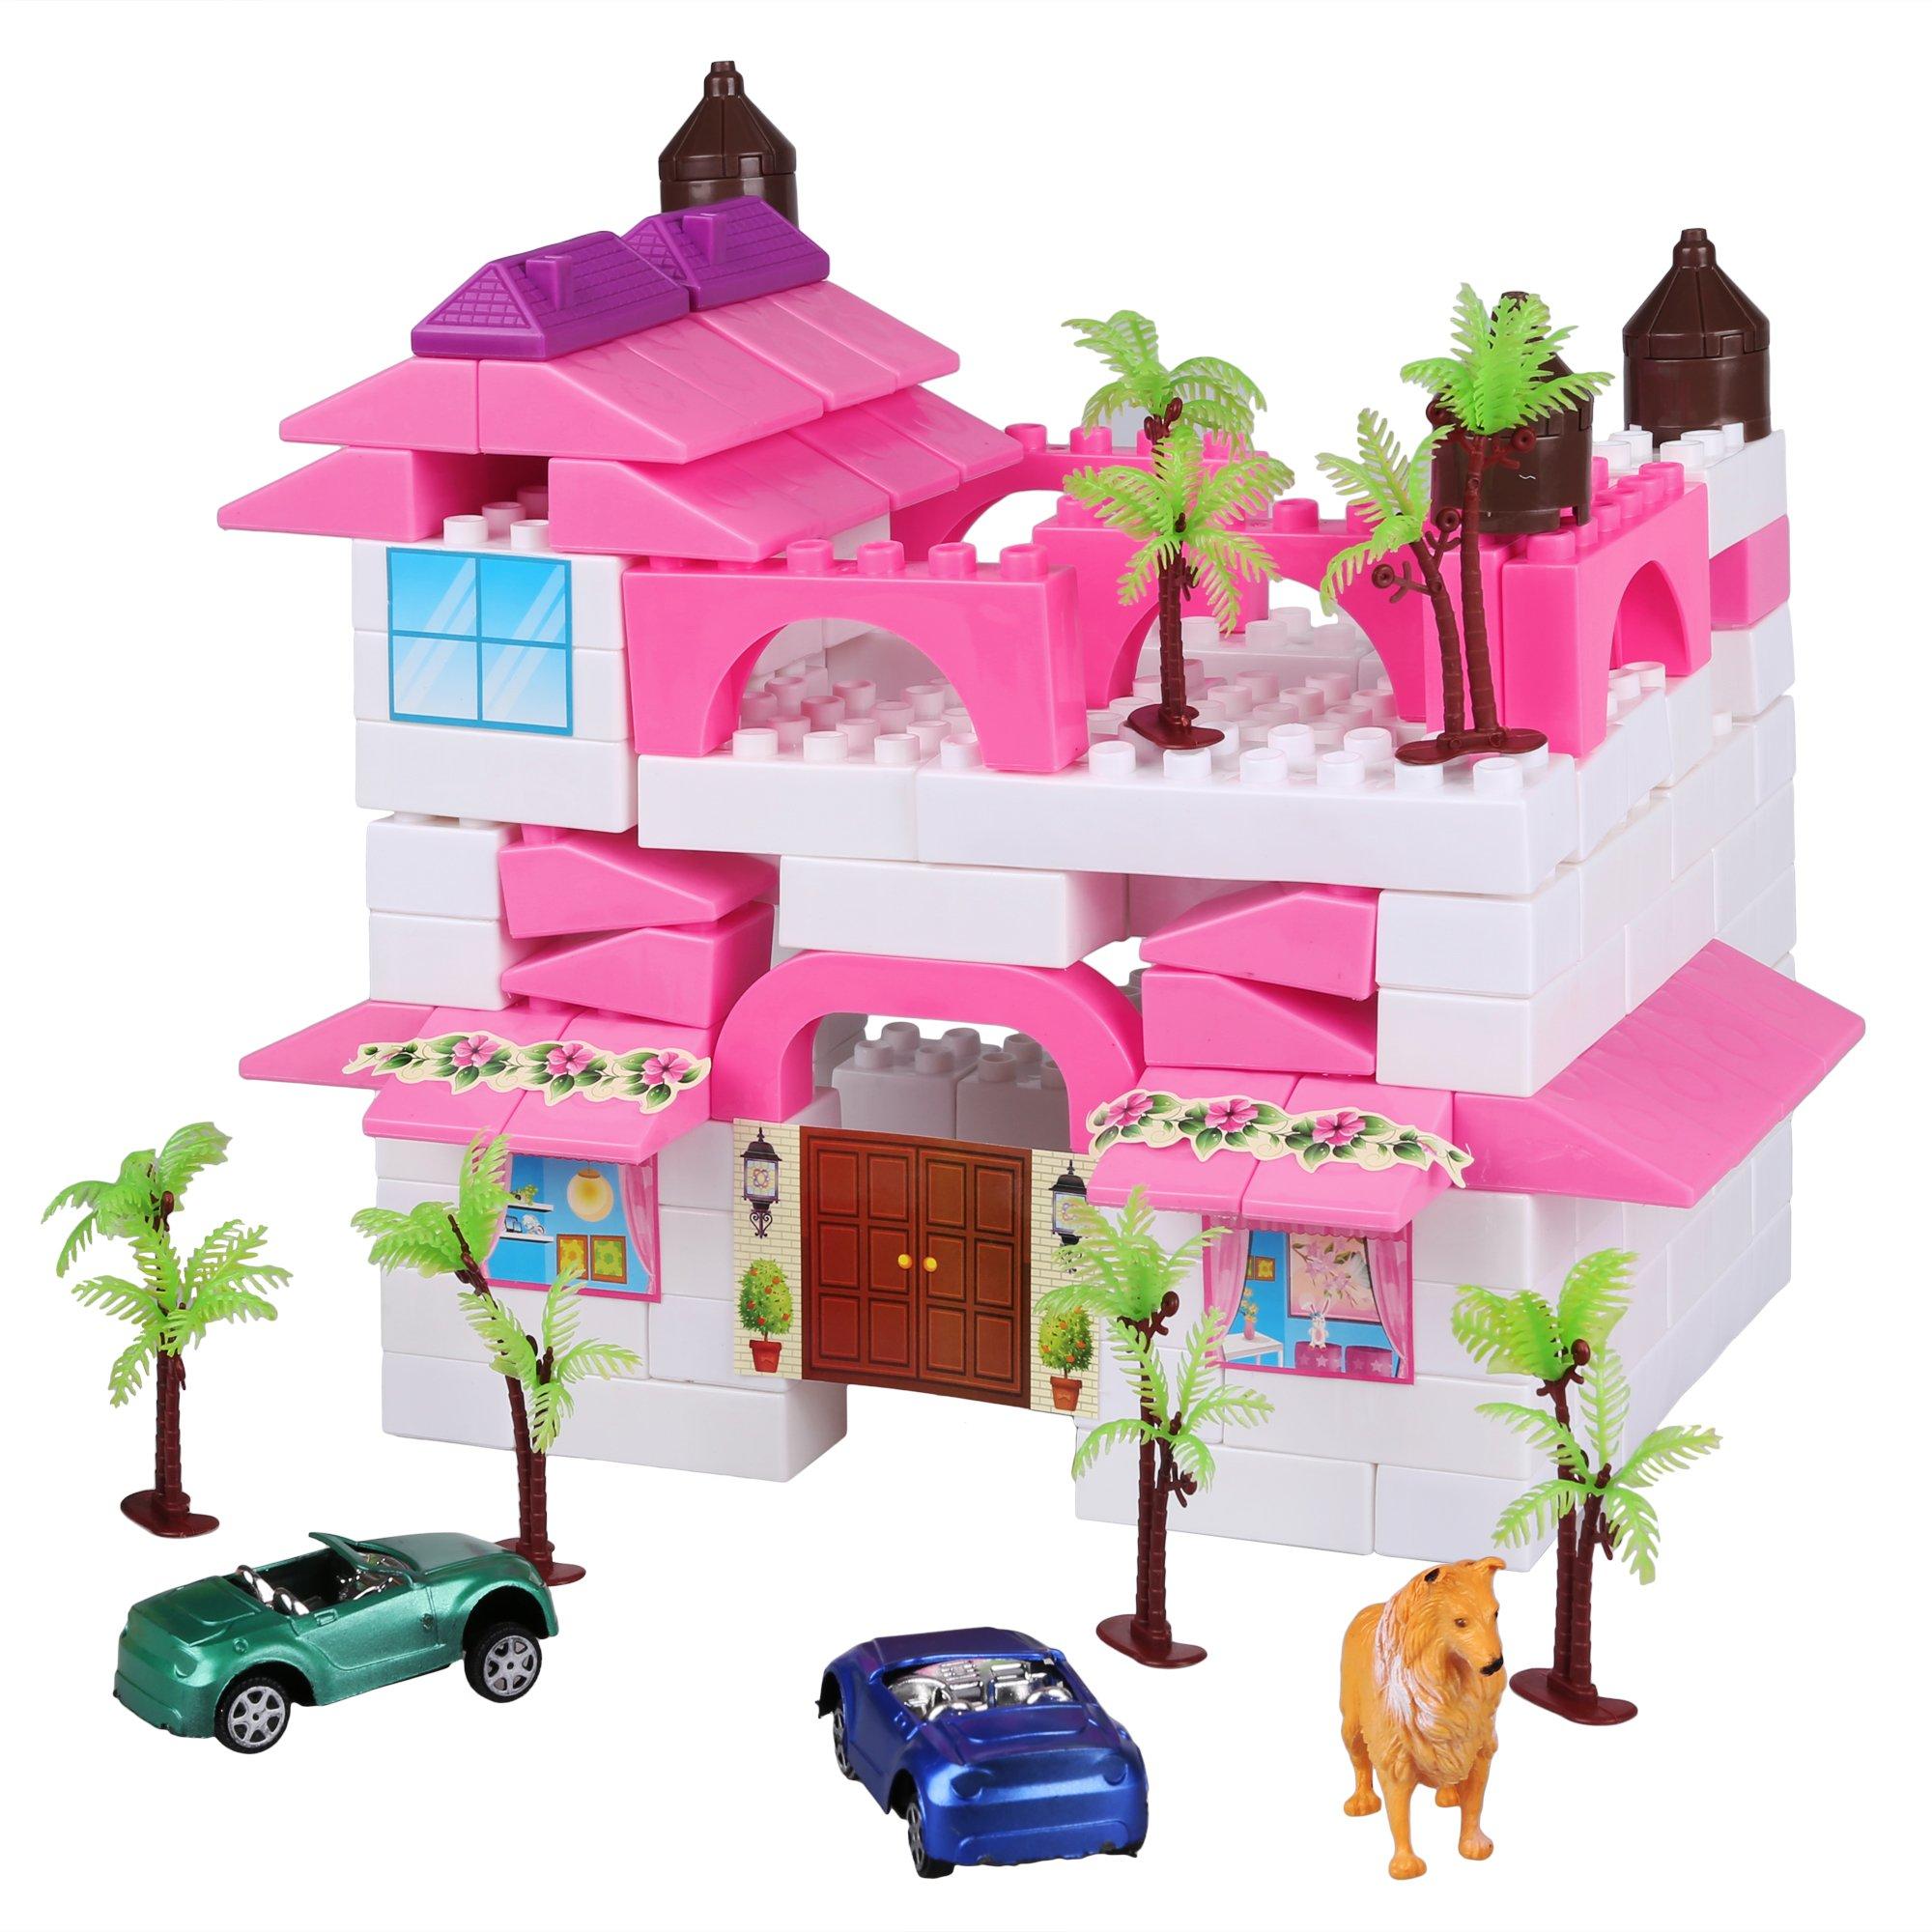 Zaplue Kid Building Block Bricks Set, 140 PCS Plastic Construction Bricks, Wisdom Development Preschool Puzzle Educational Toy Child Gift (Above 3 Year-Old) (Style 1)